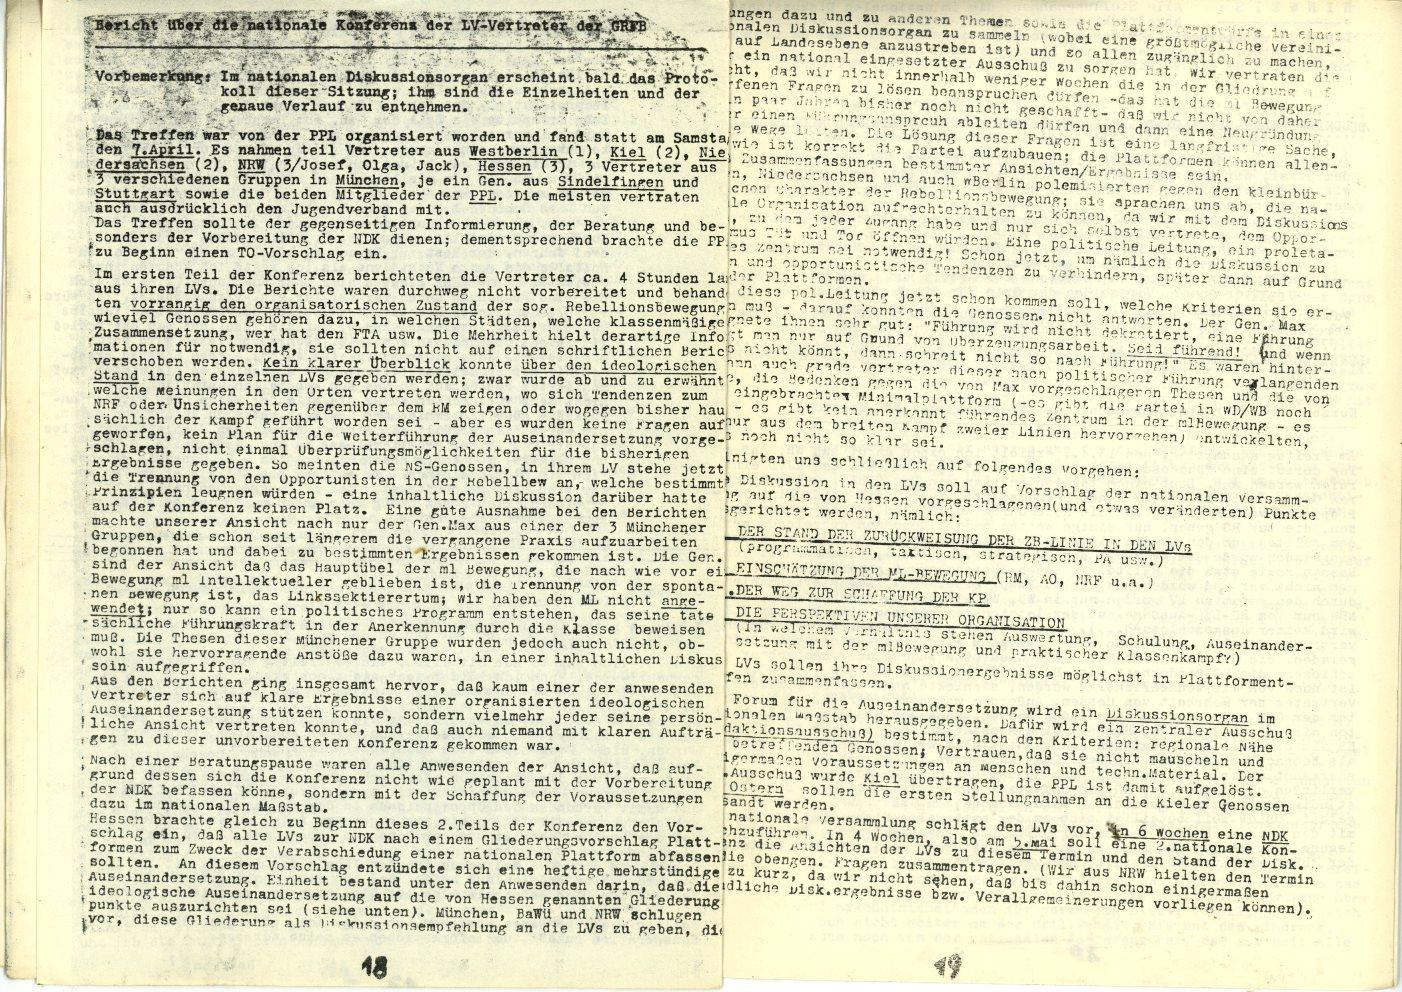 ZB_Rebellionsbewegung_Diskussionsorgan_19730419_07